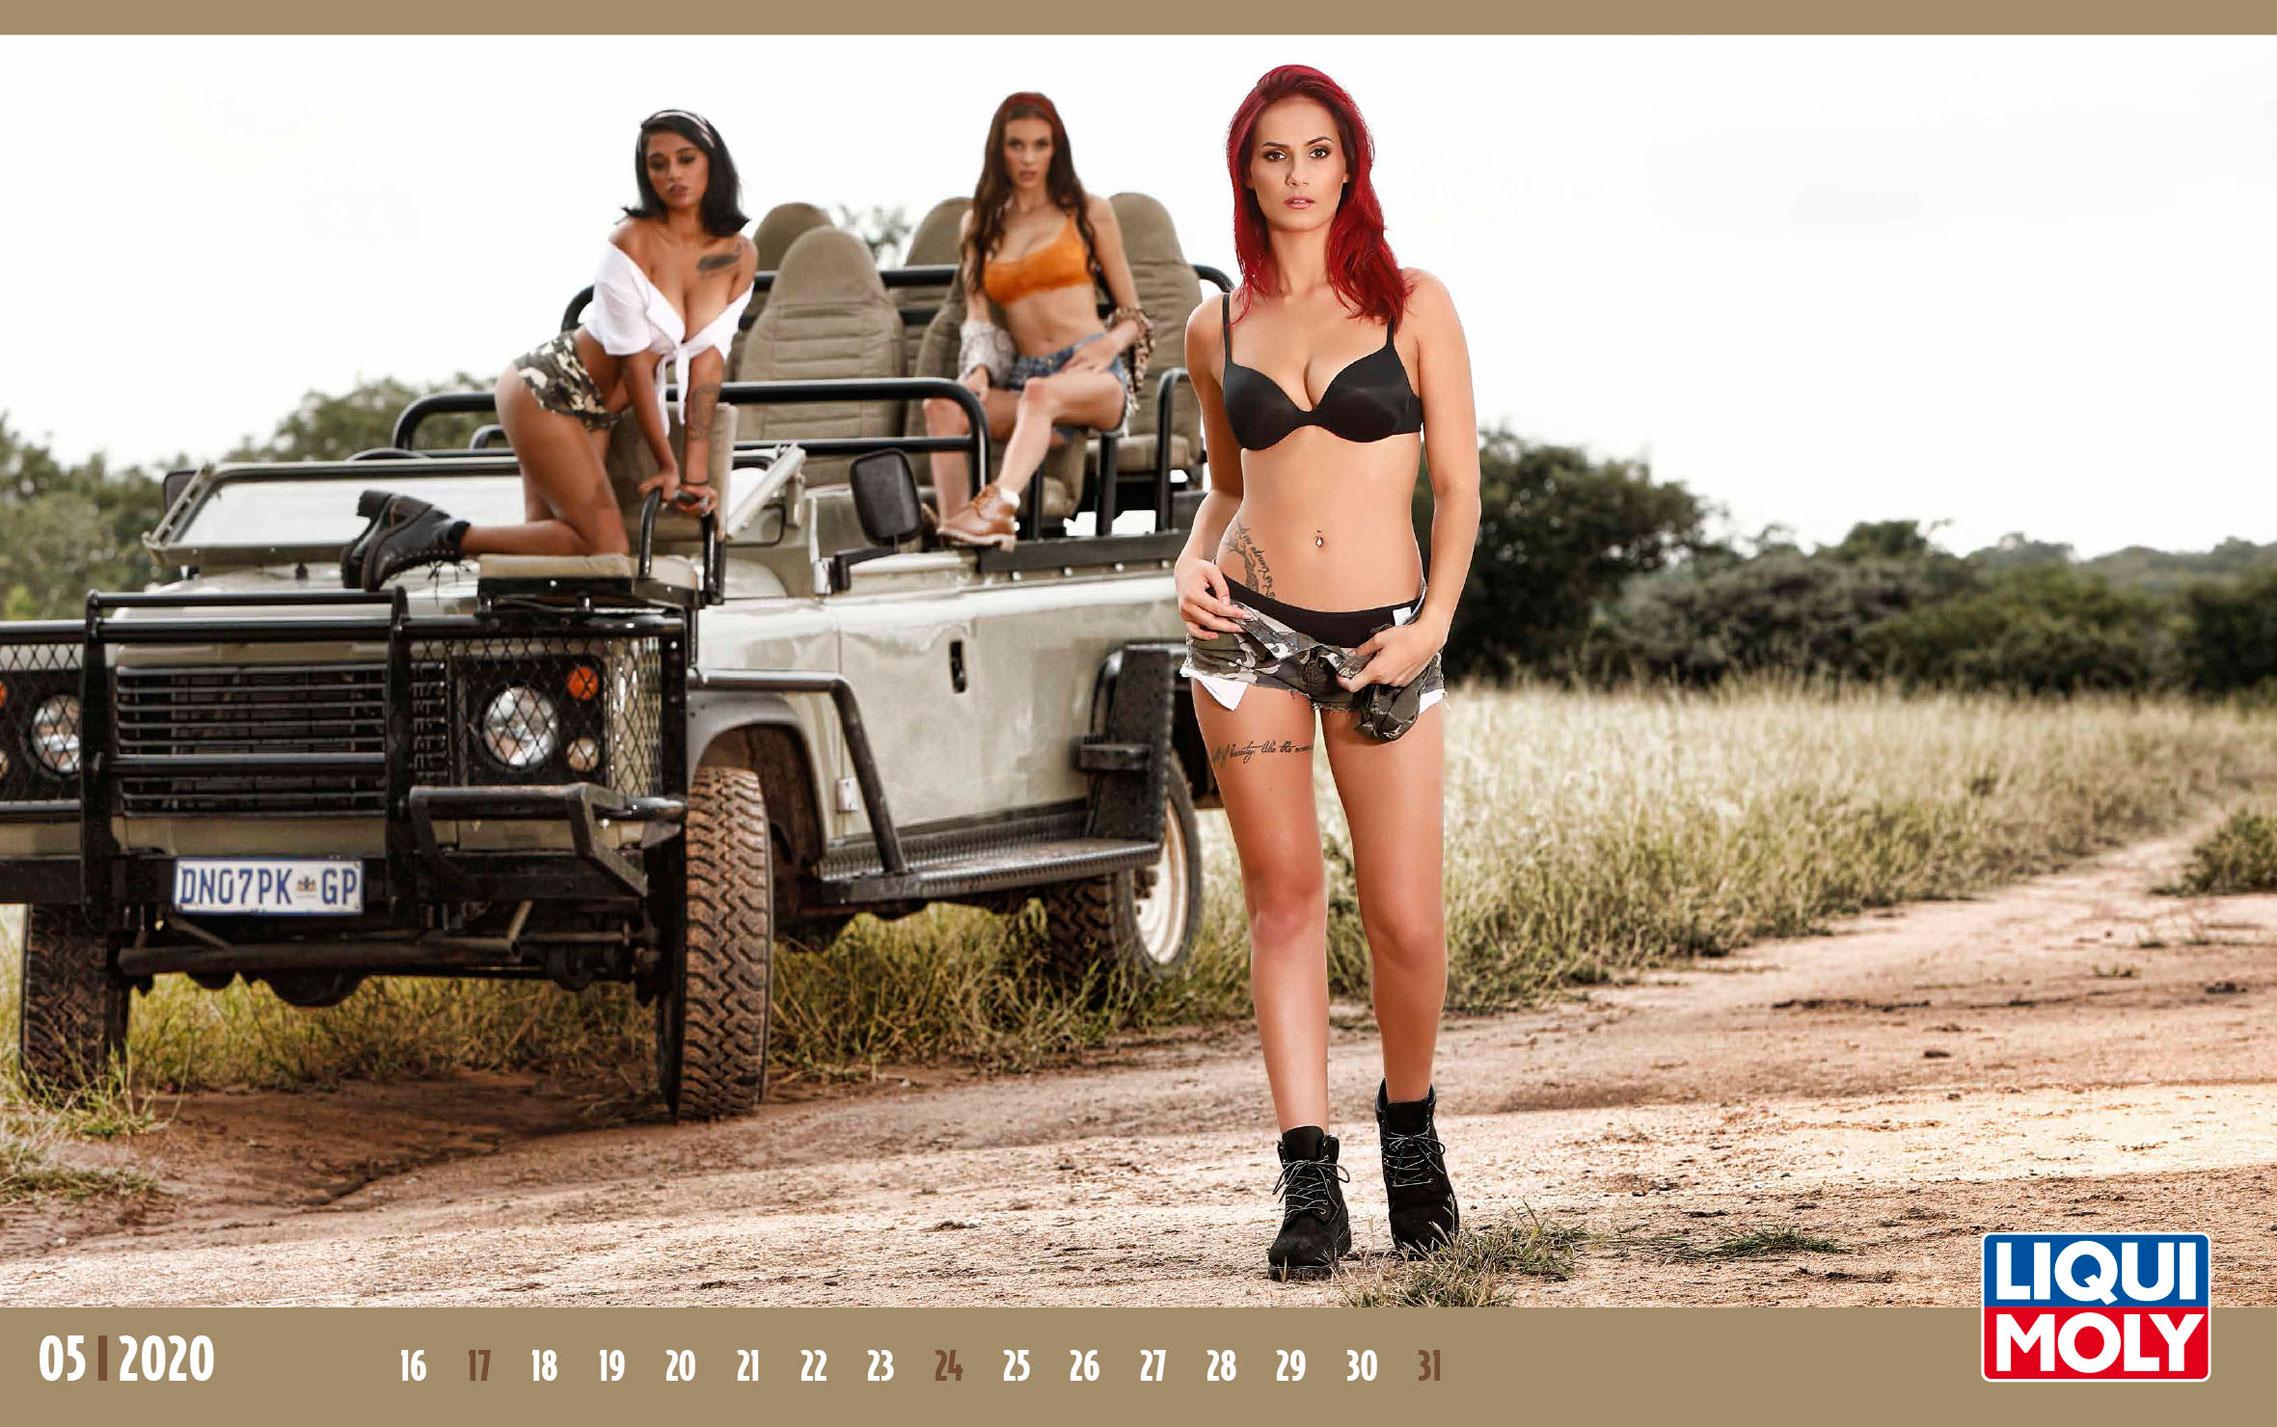 Календарь с девушками автоконцерна Liqui Moly, 2020 год / май-2